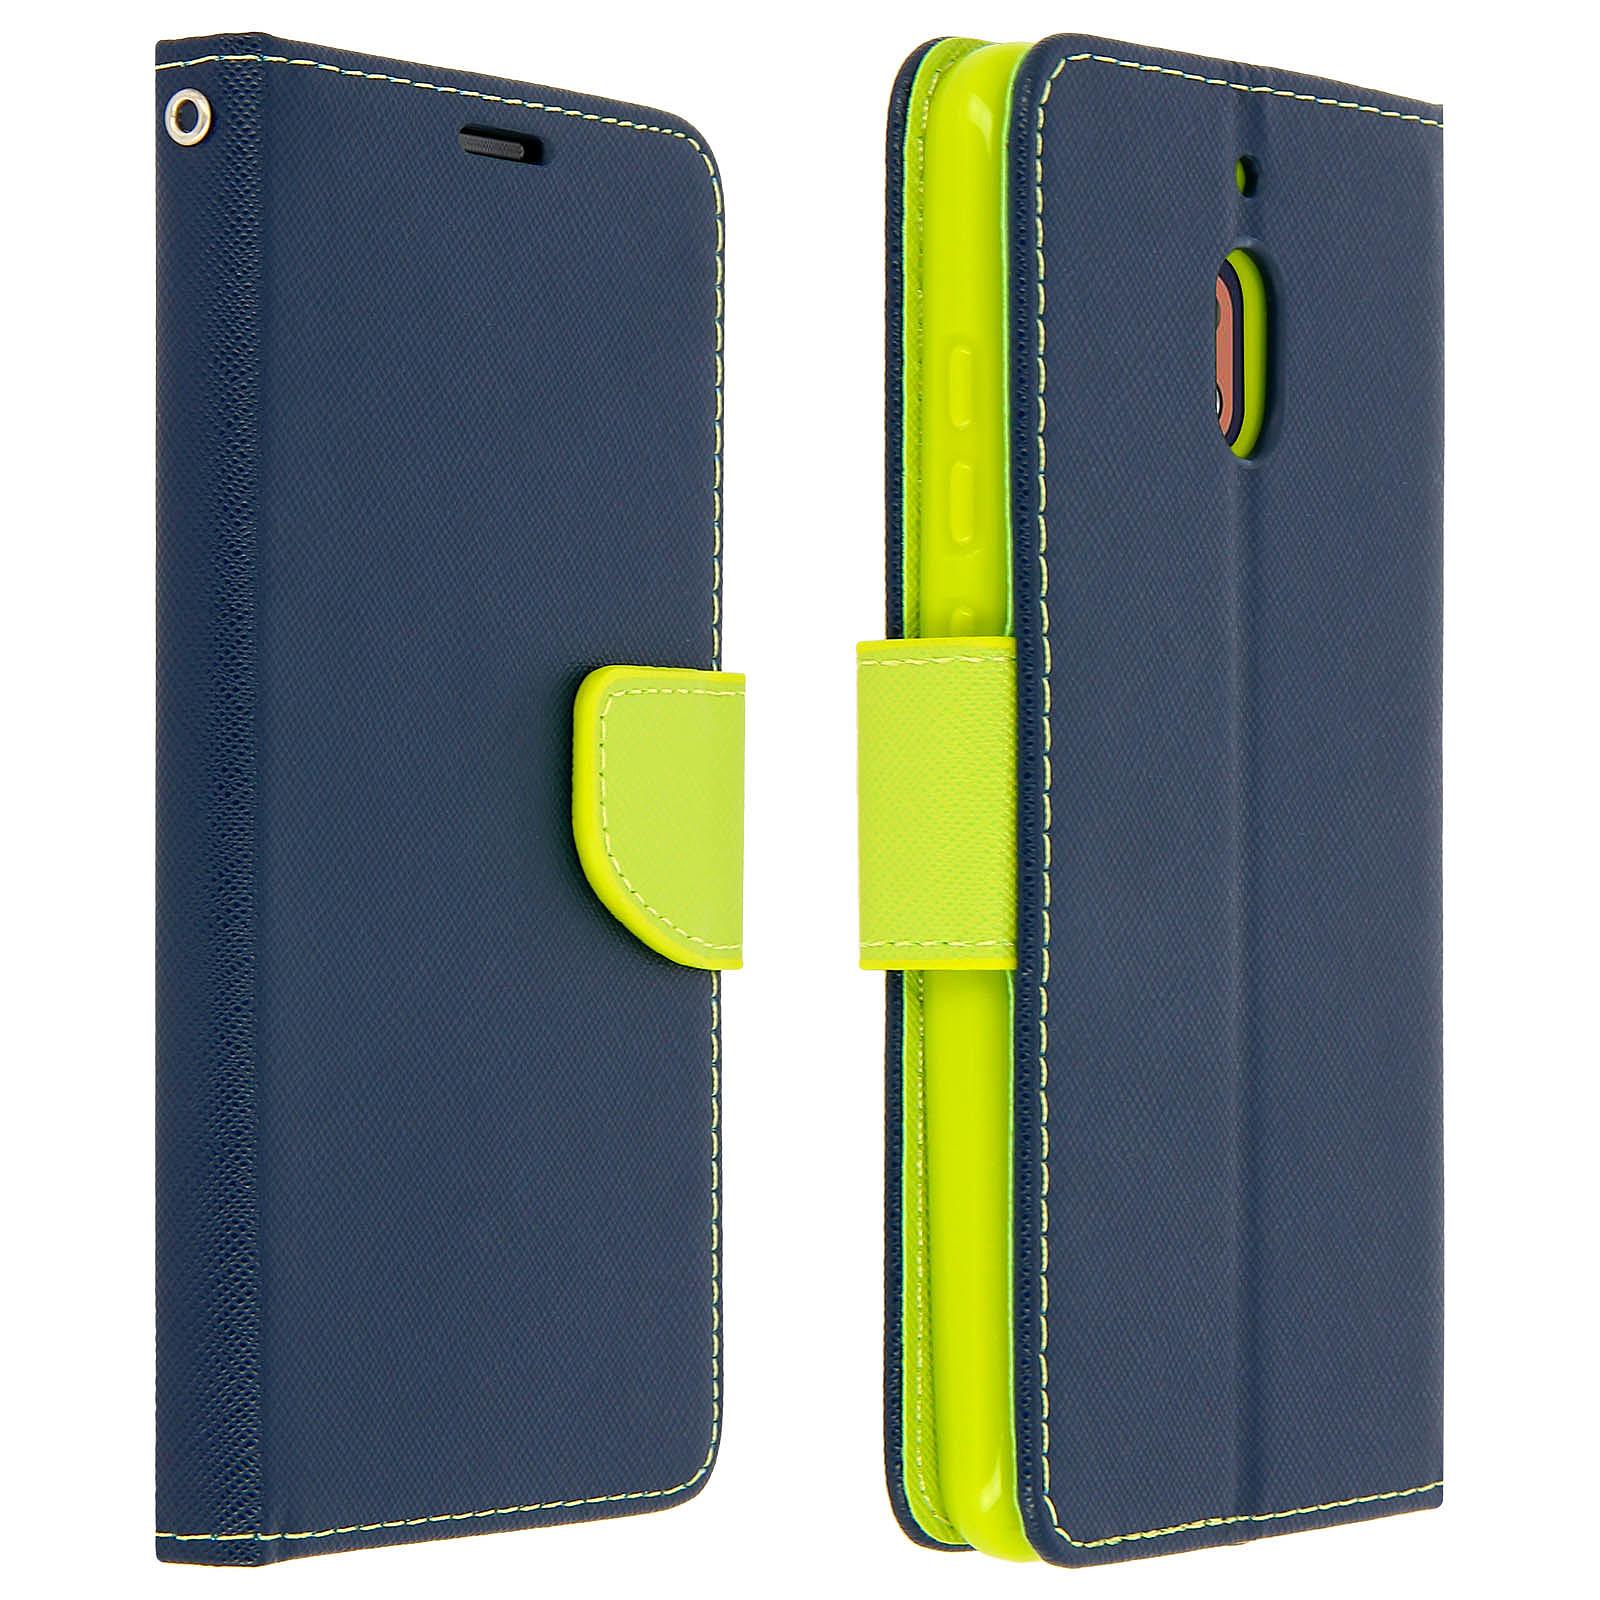 Avizar Etui folio Bleu pour Nokia 2.1